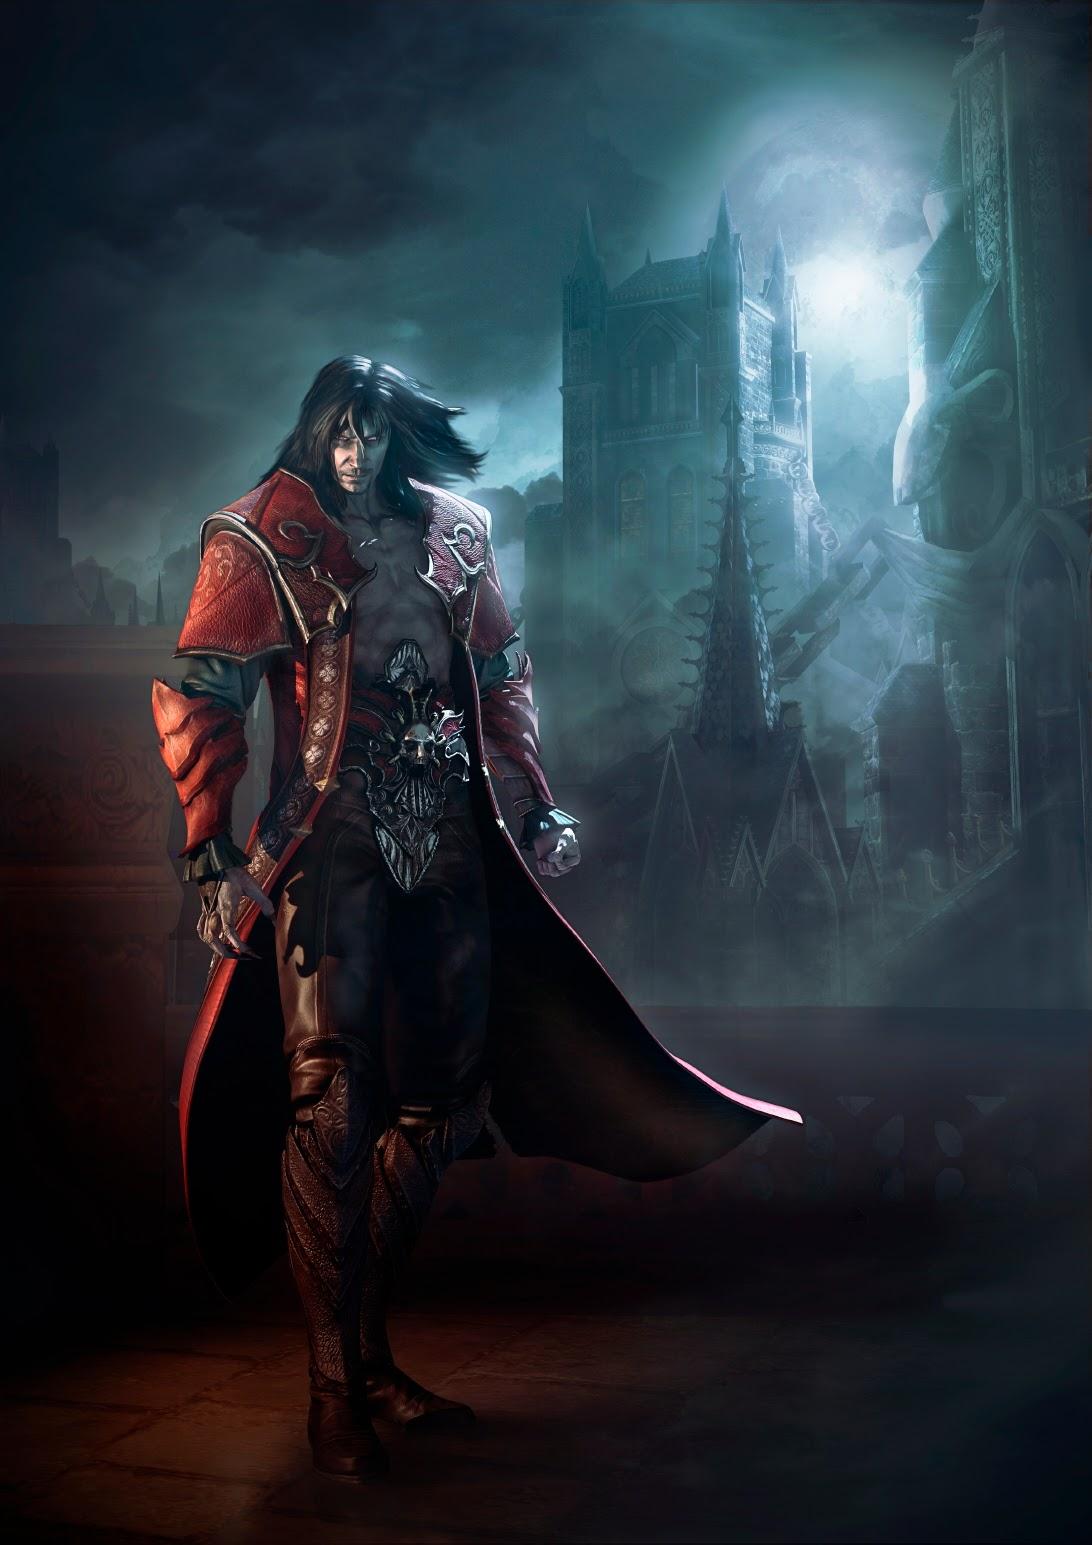 https://game-saga.com/wp-content/uploads/2018/12/castlevania-lords-of-shadow-2-artwork-3.jpg